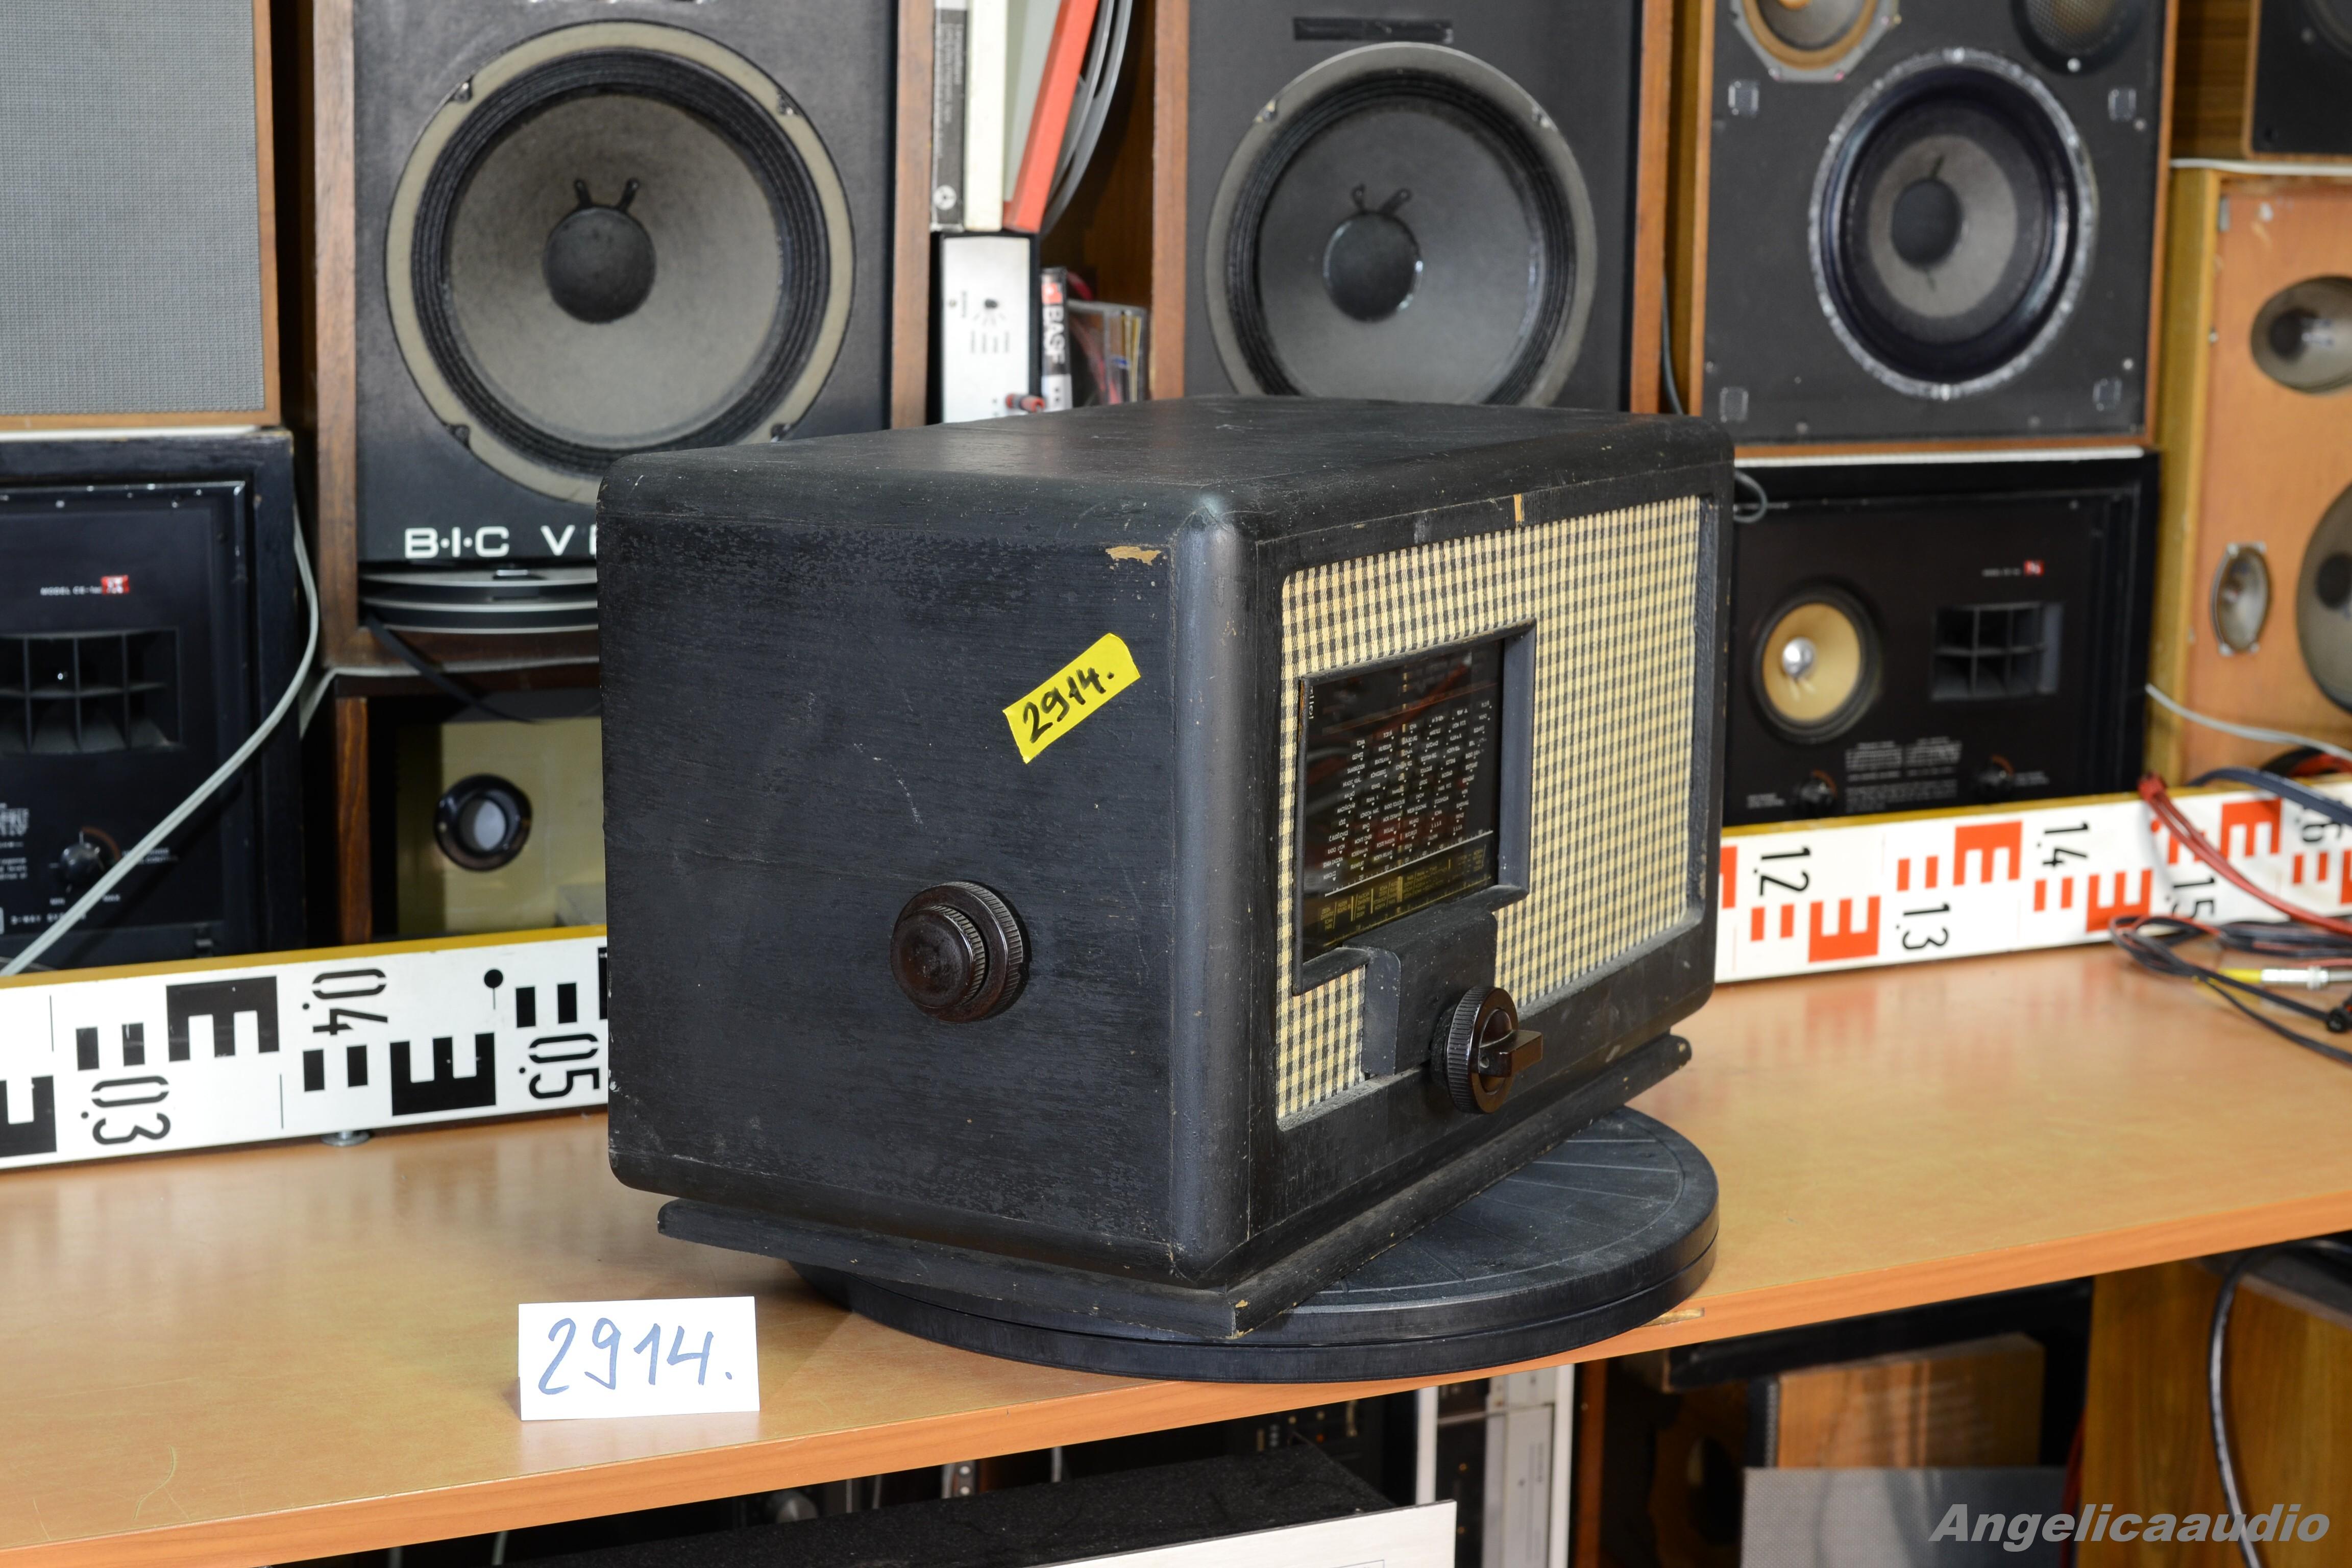 mikrofona radio mk 375 0 angelicaaudio 1990. Black Bedroom Furniture Sets. Home Design Ideas